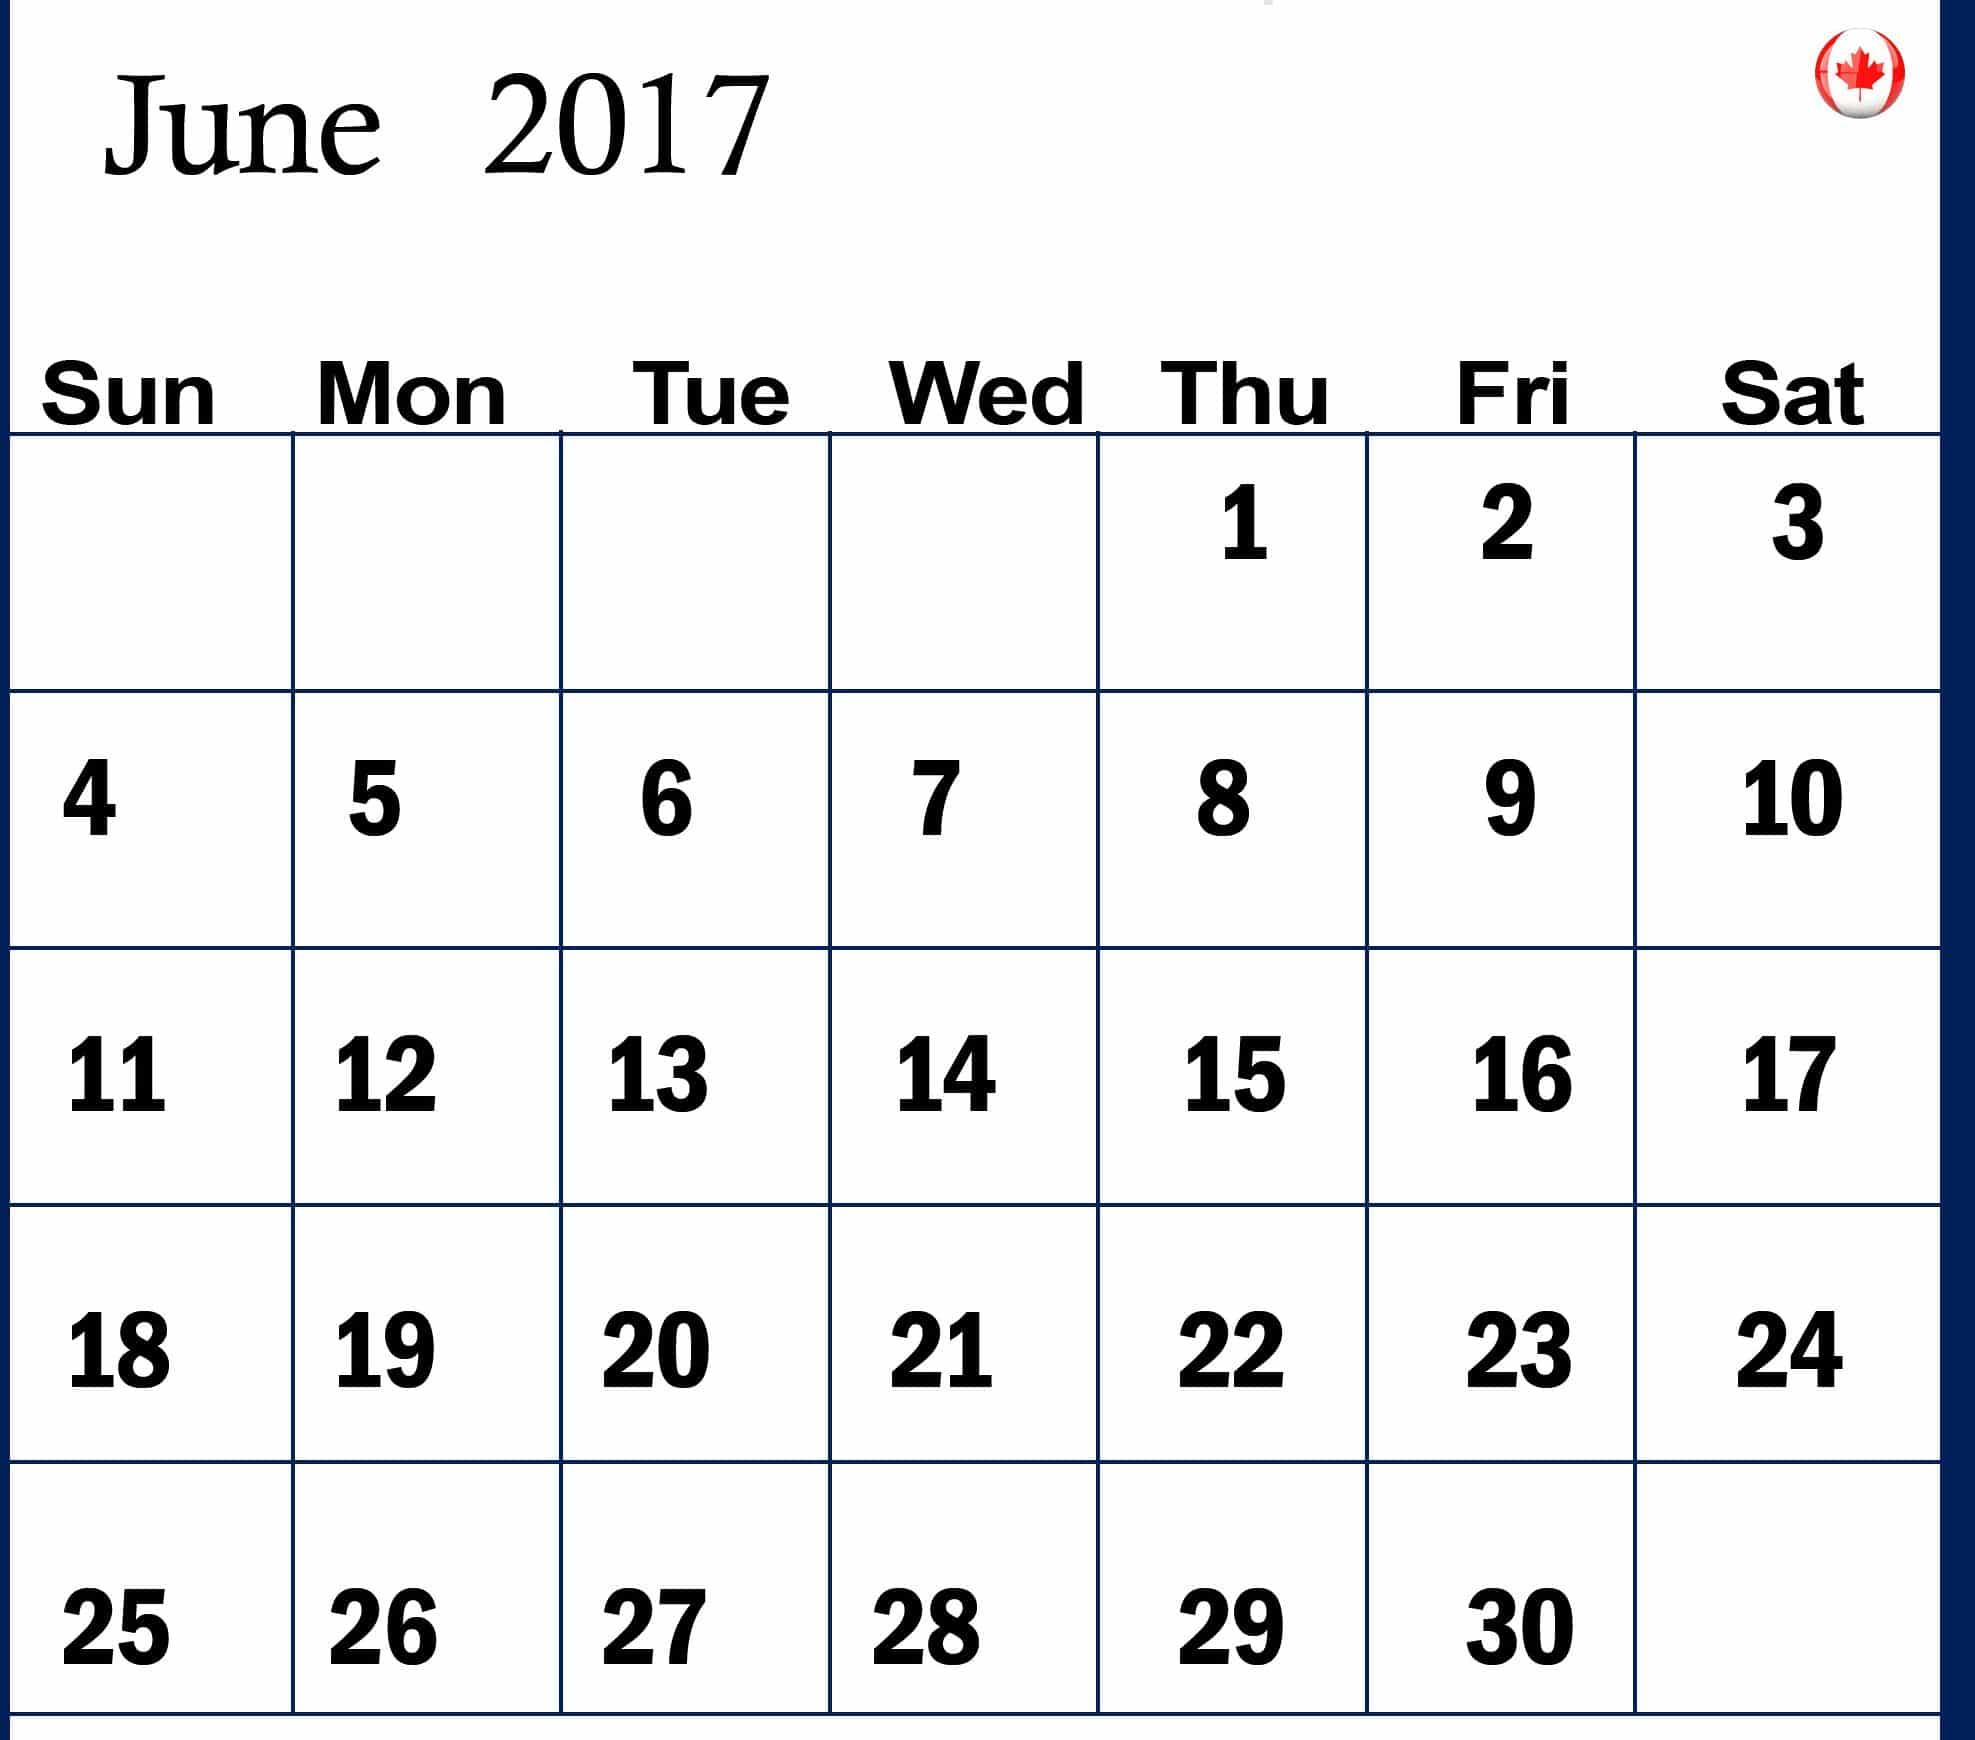 Online June 2017 calendar Canada